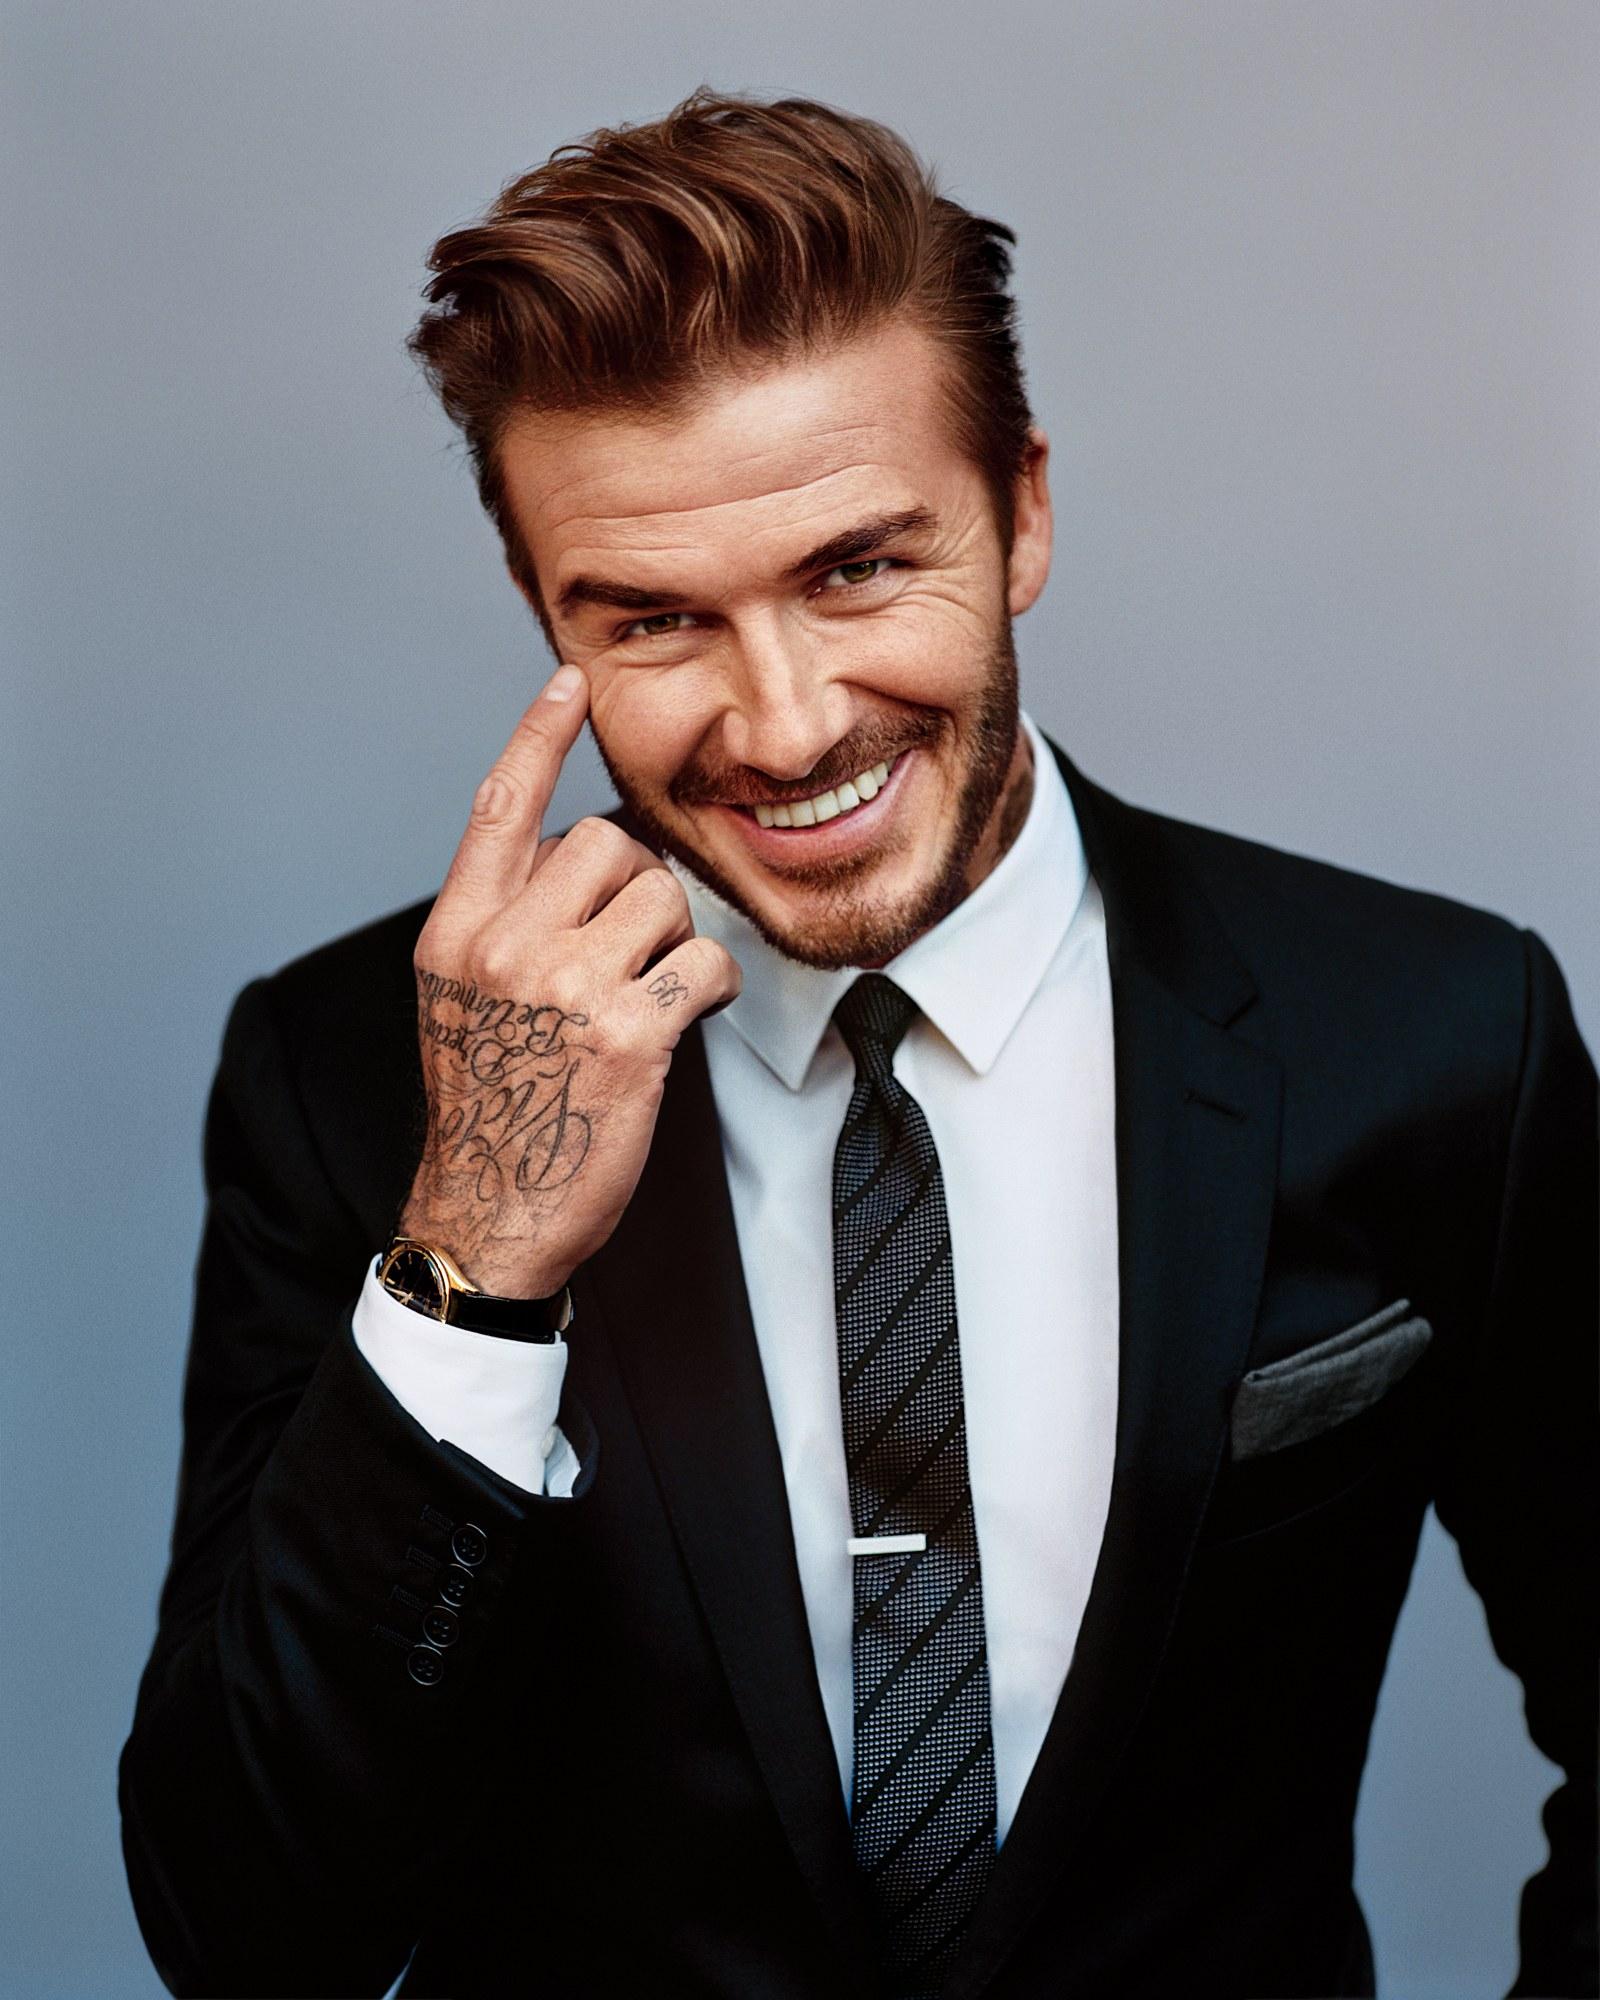 David Beckham Wallpapers High Quality Download Free